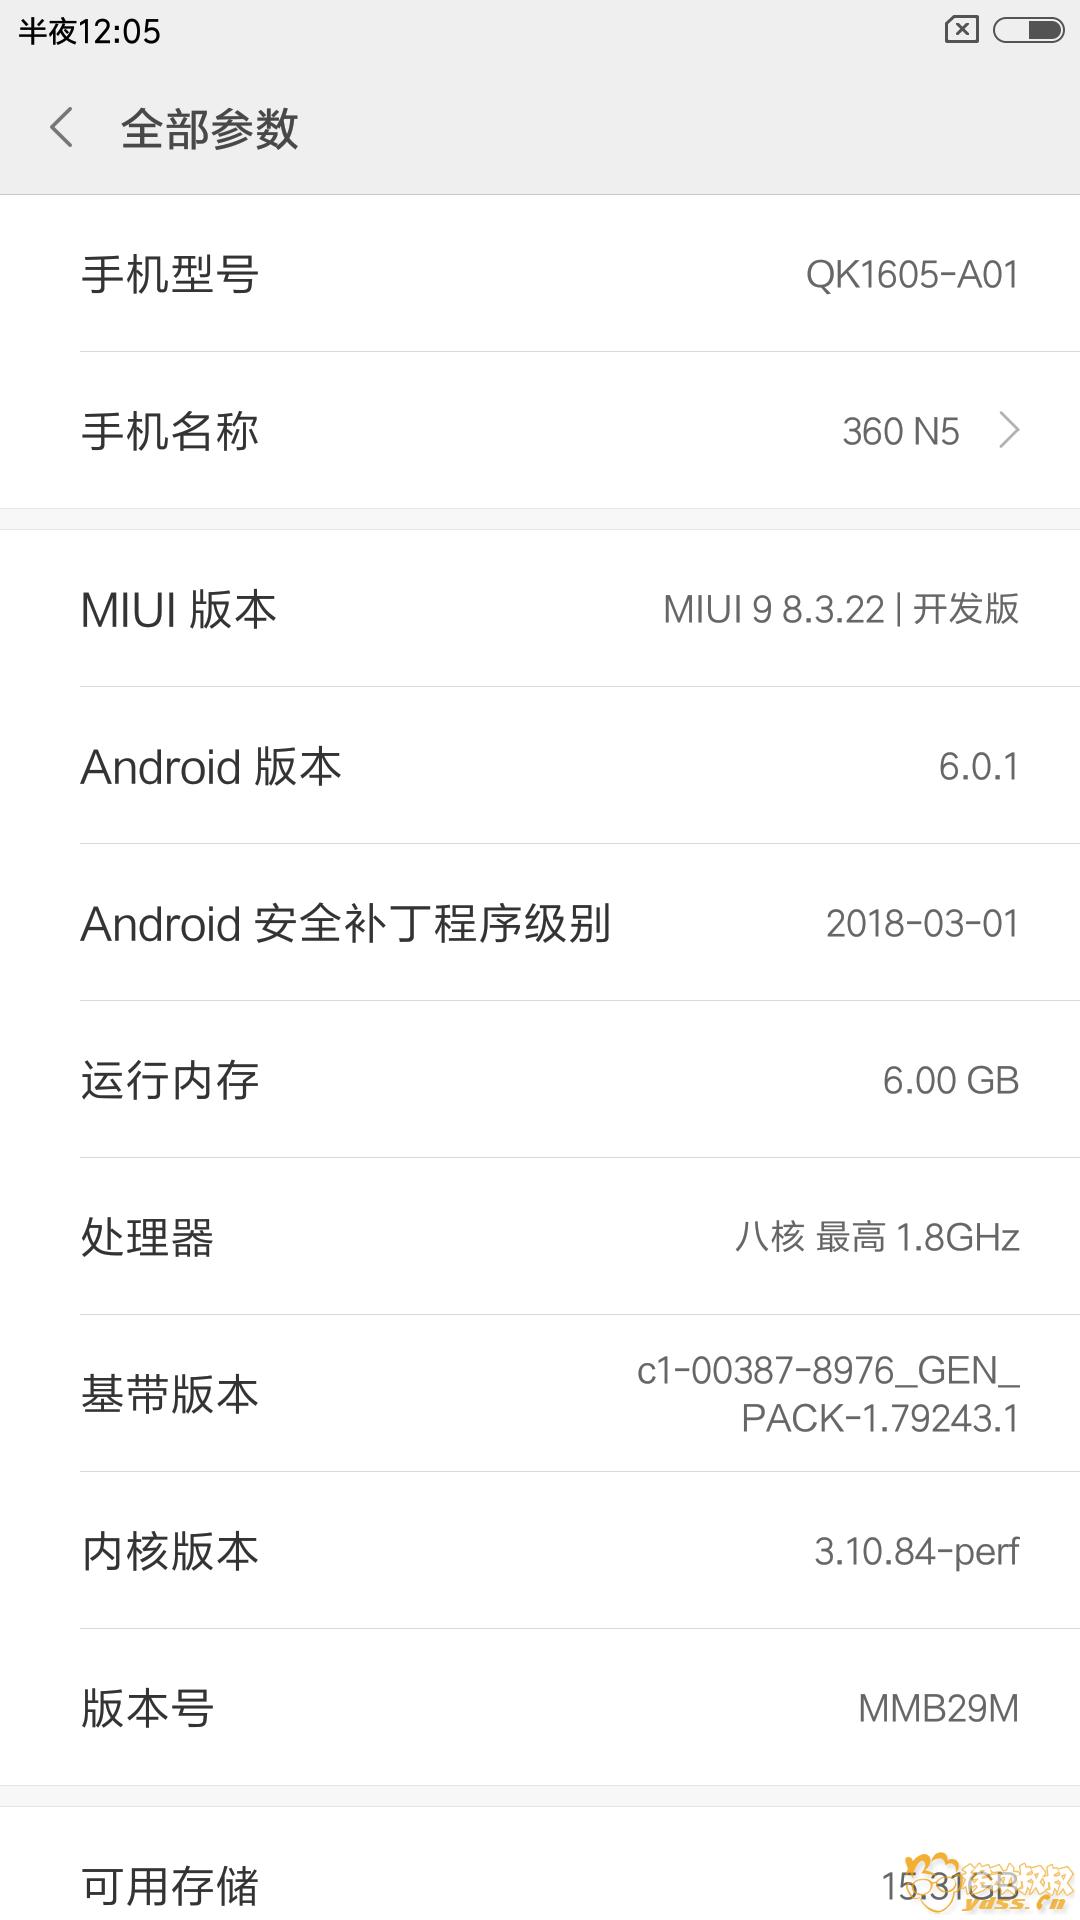 Screenshot_2016-01-01-00-05-56-514_com.android.settings.png